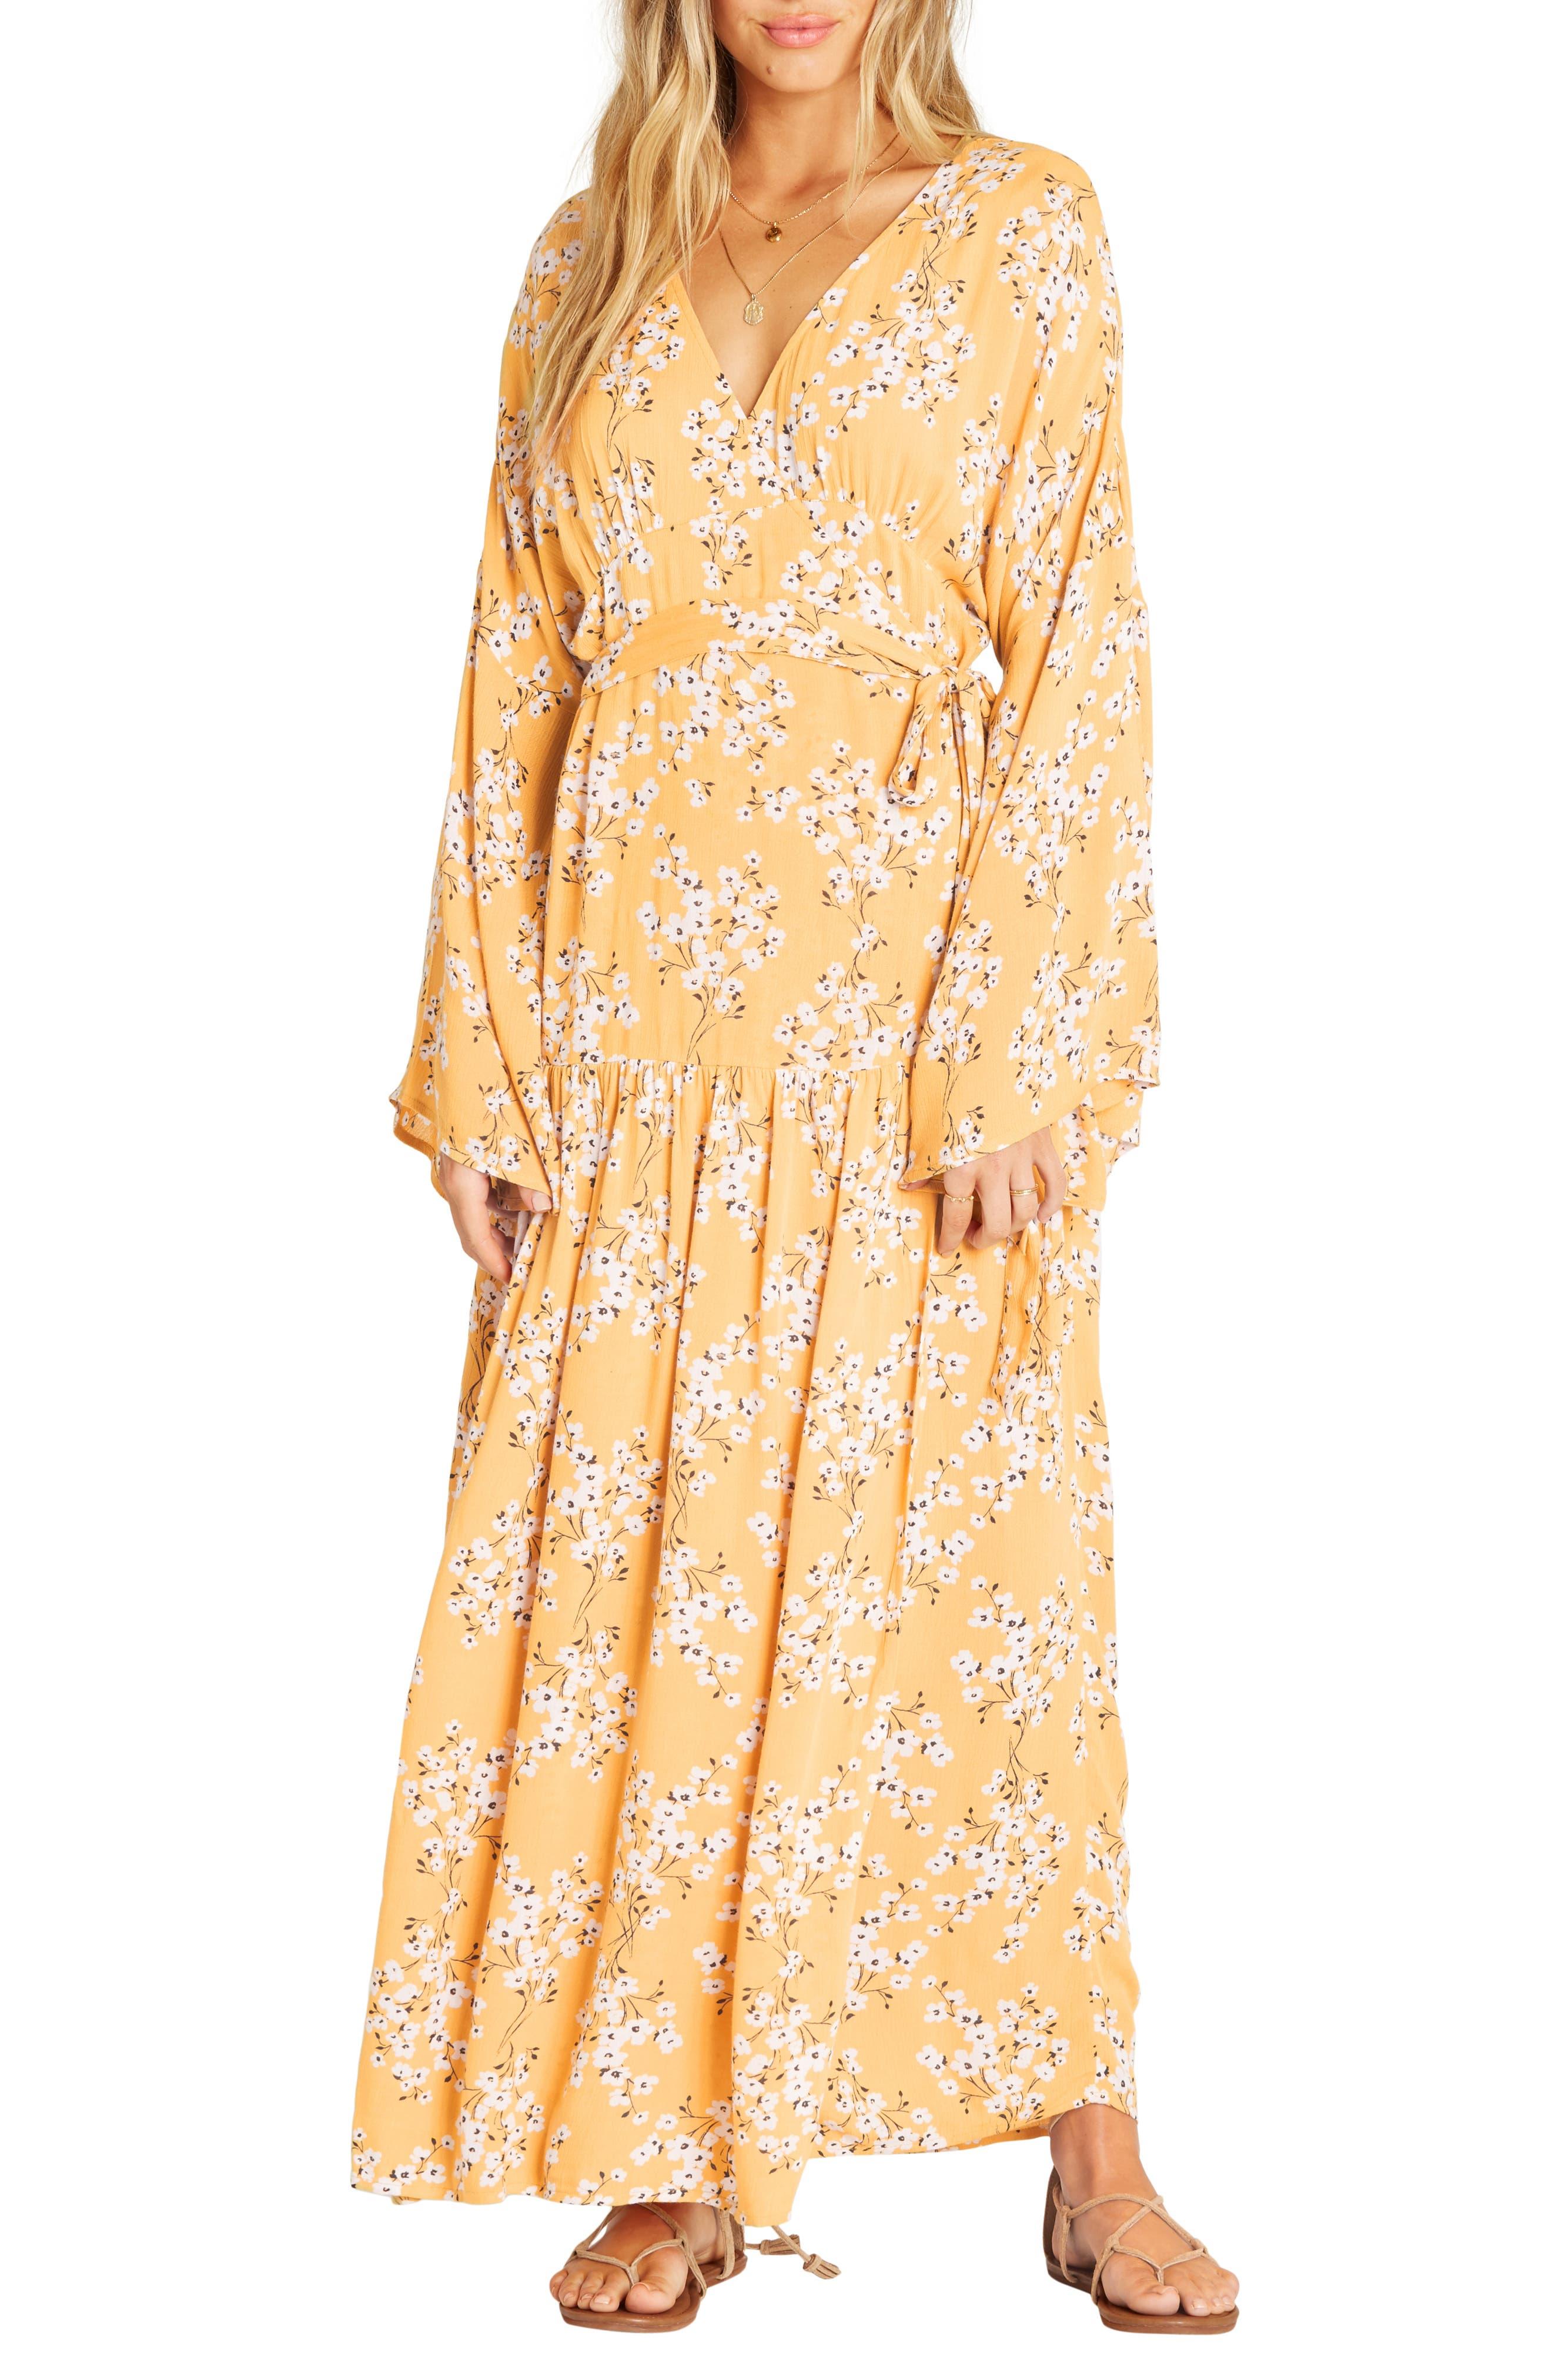 BILLABONG, My Favorite Maxi Dress, Main thumbnail 1, color, GOLDEN HOUR